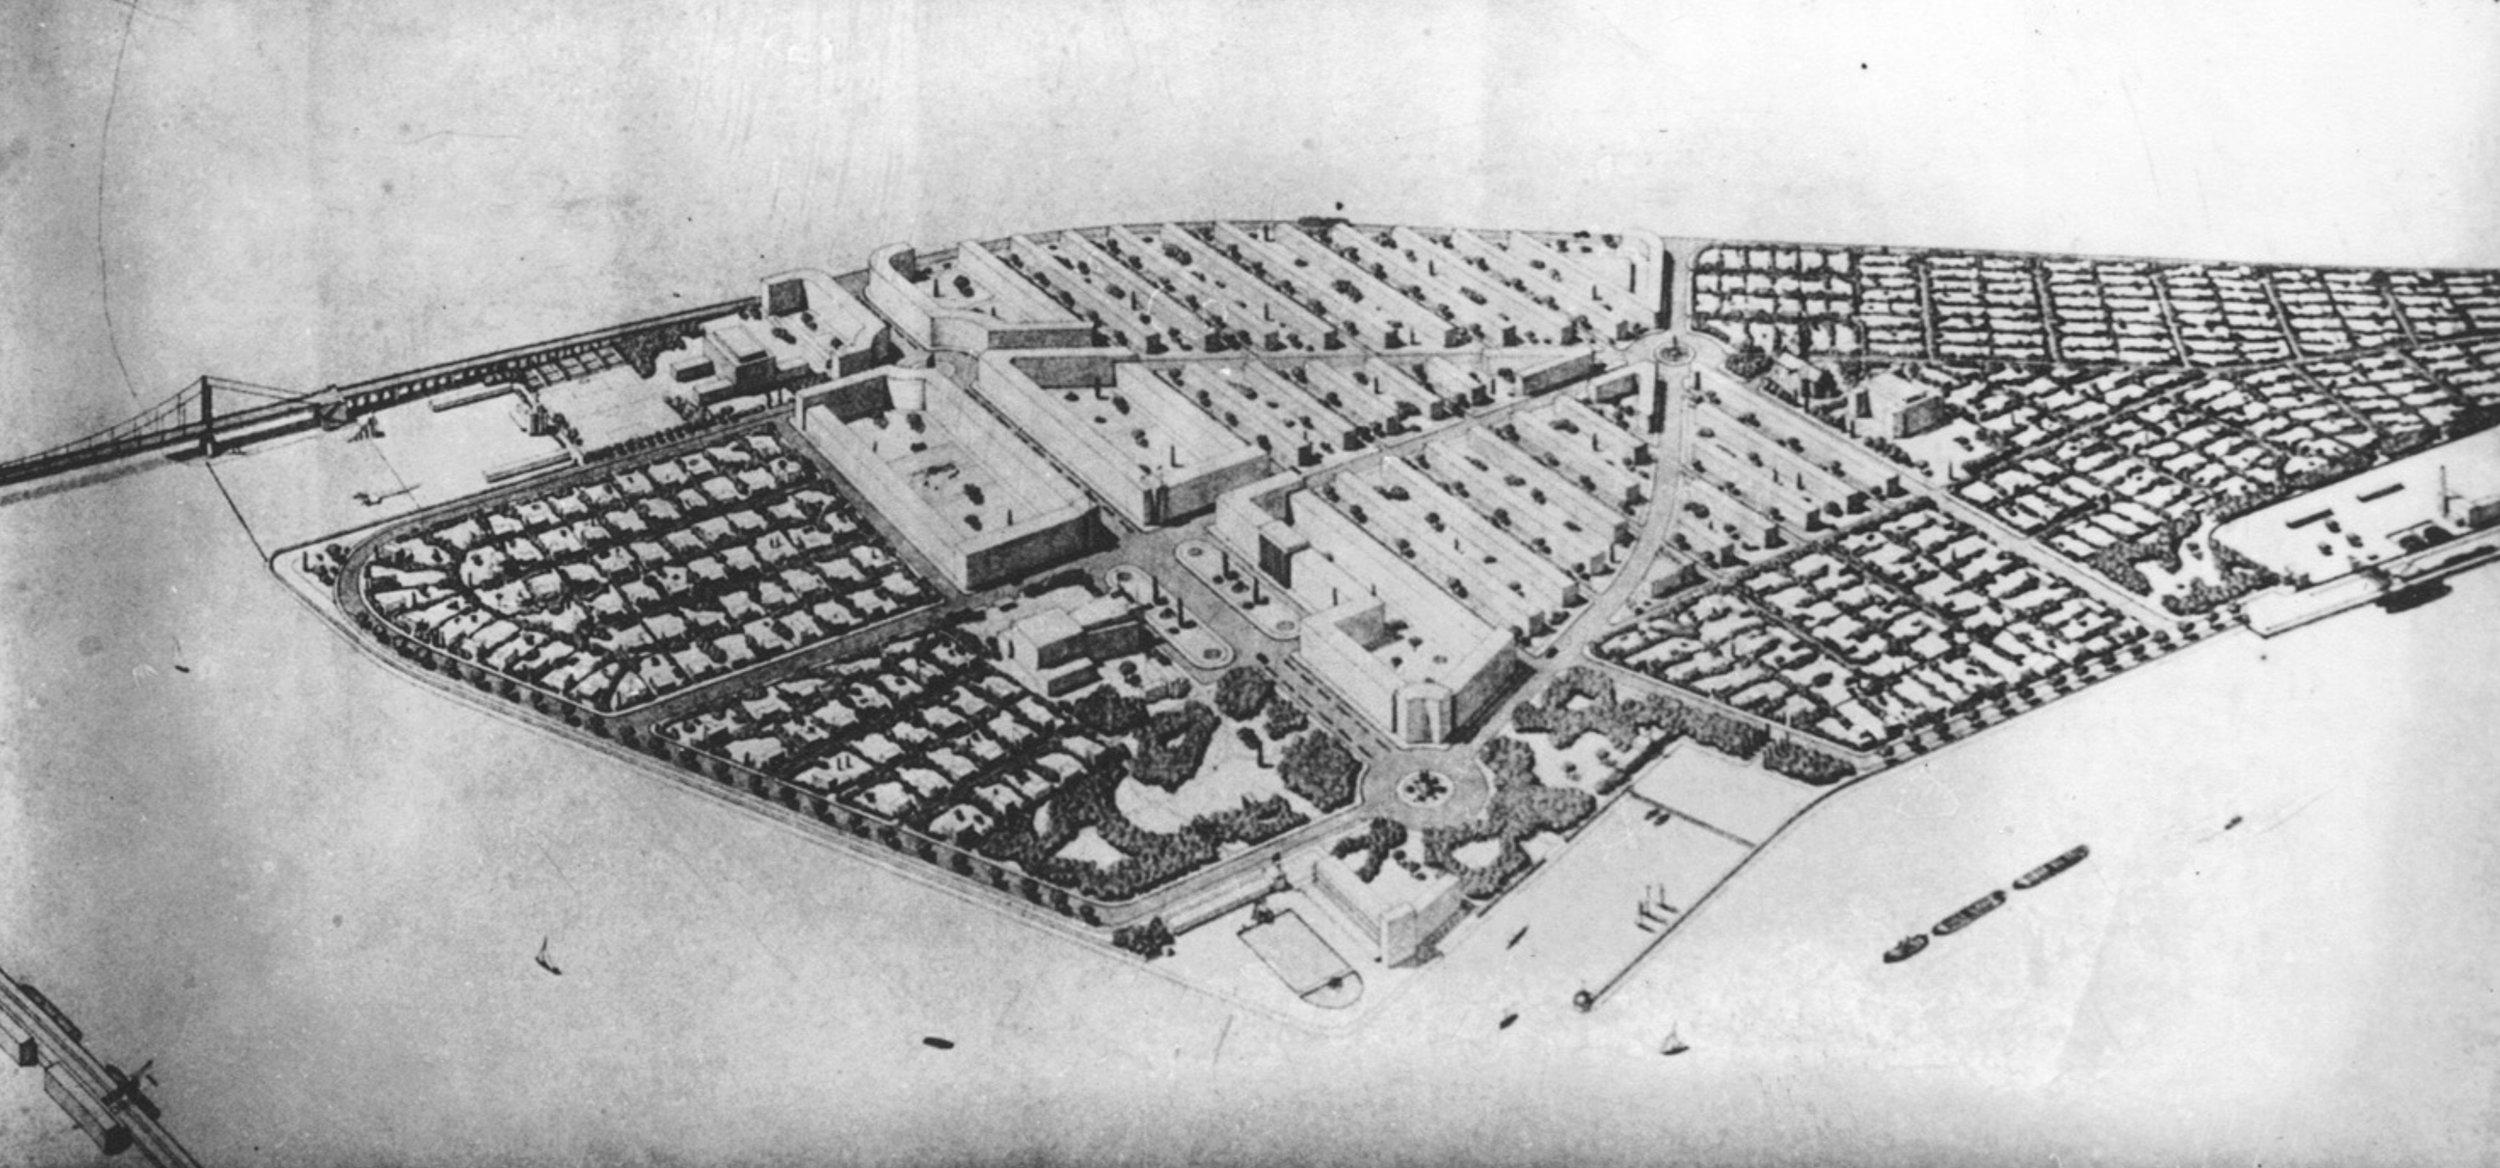 Højgaard&Schultz (Kopenhagen), Plan naselja sa desne strane Zemunskog mosta, 1938.